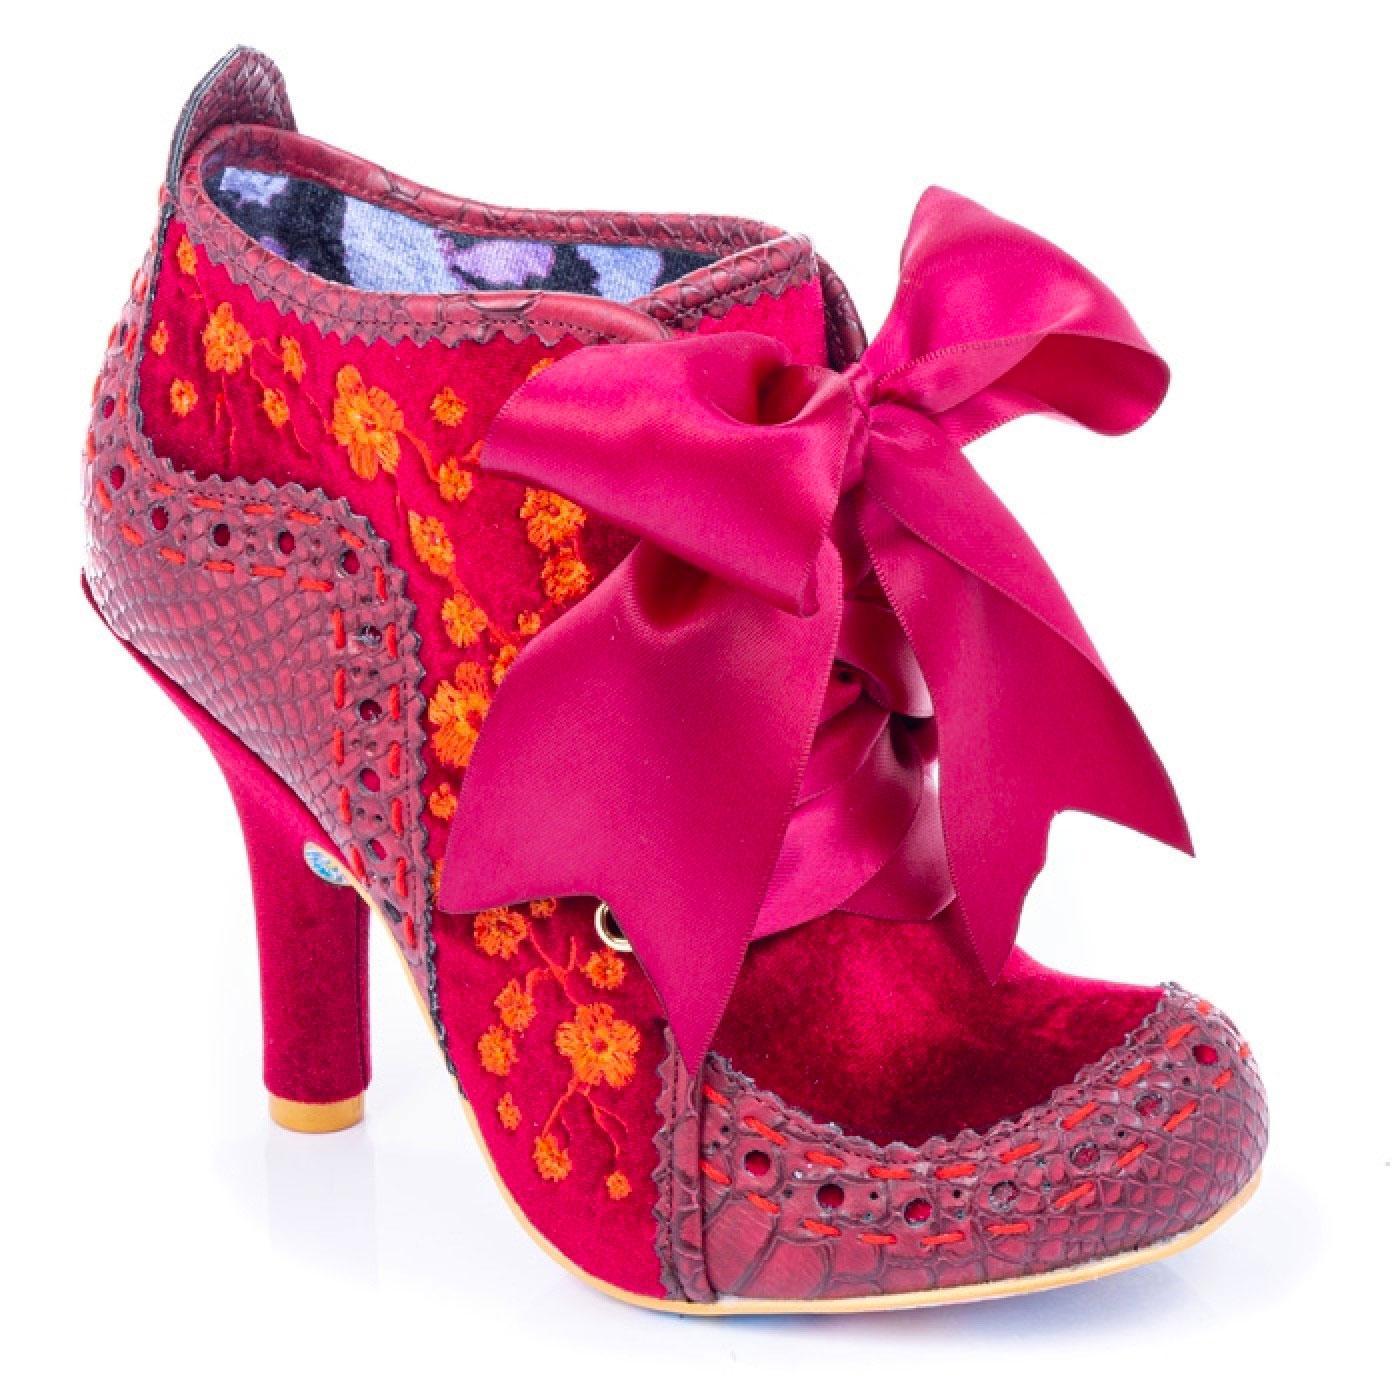 Teenage Abigail IRREGULAR CHOICE Velvet Boots Bu